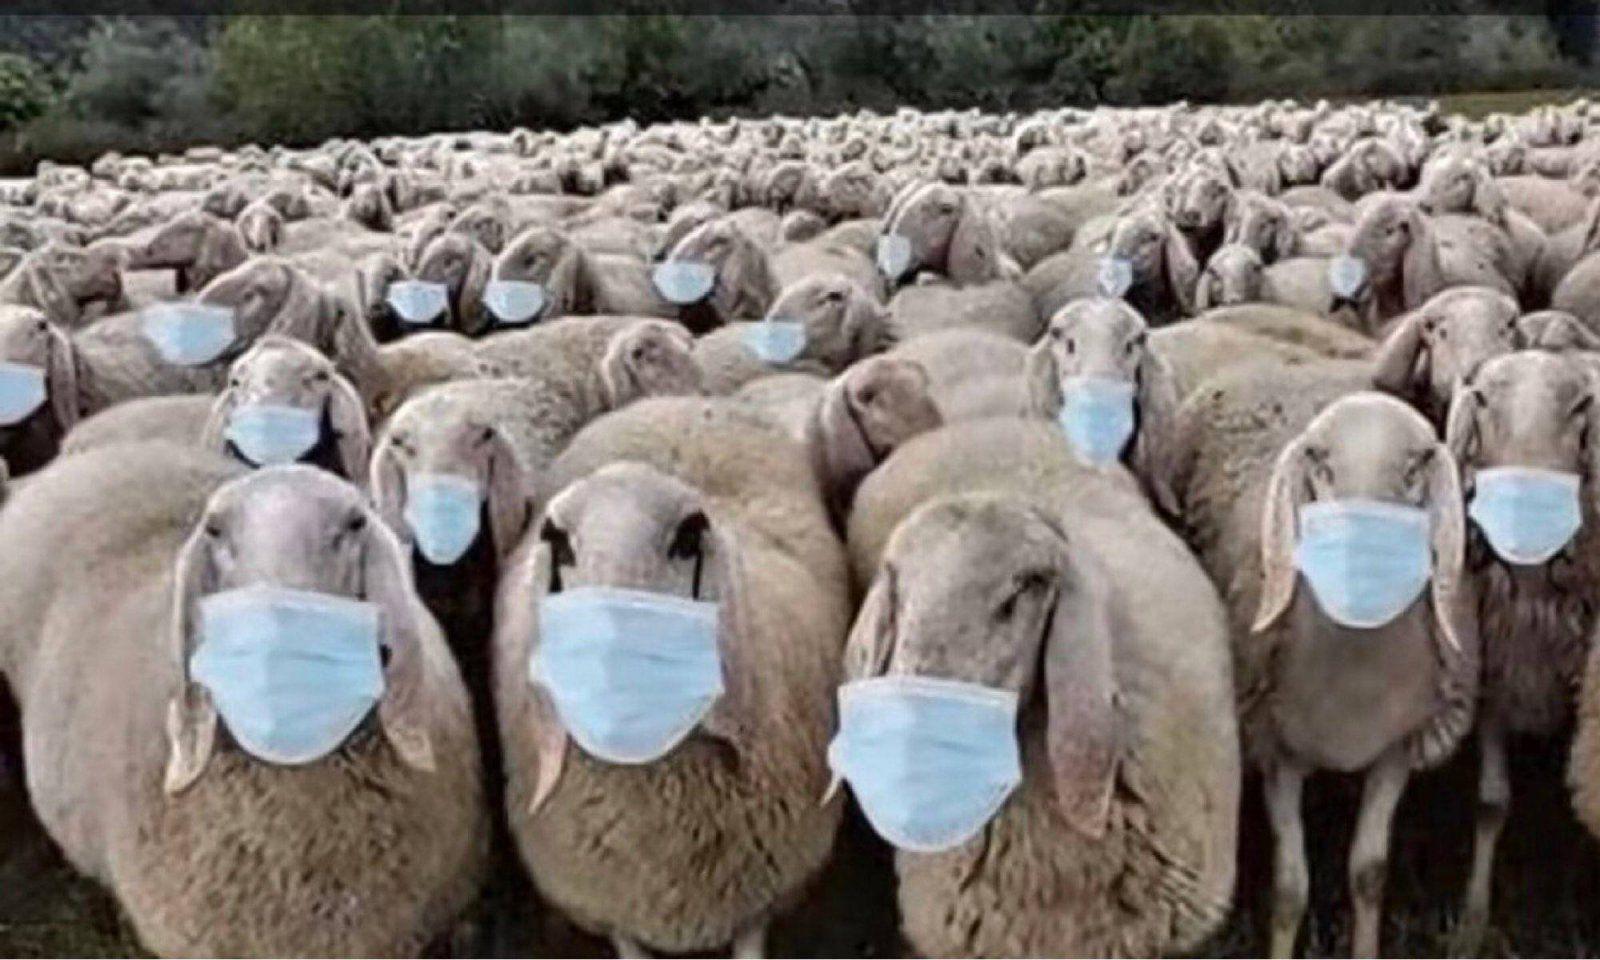 SheepWithMasks.jpg